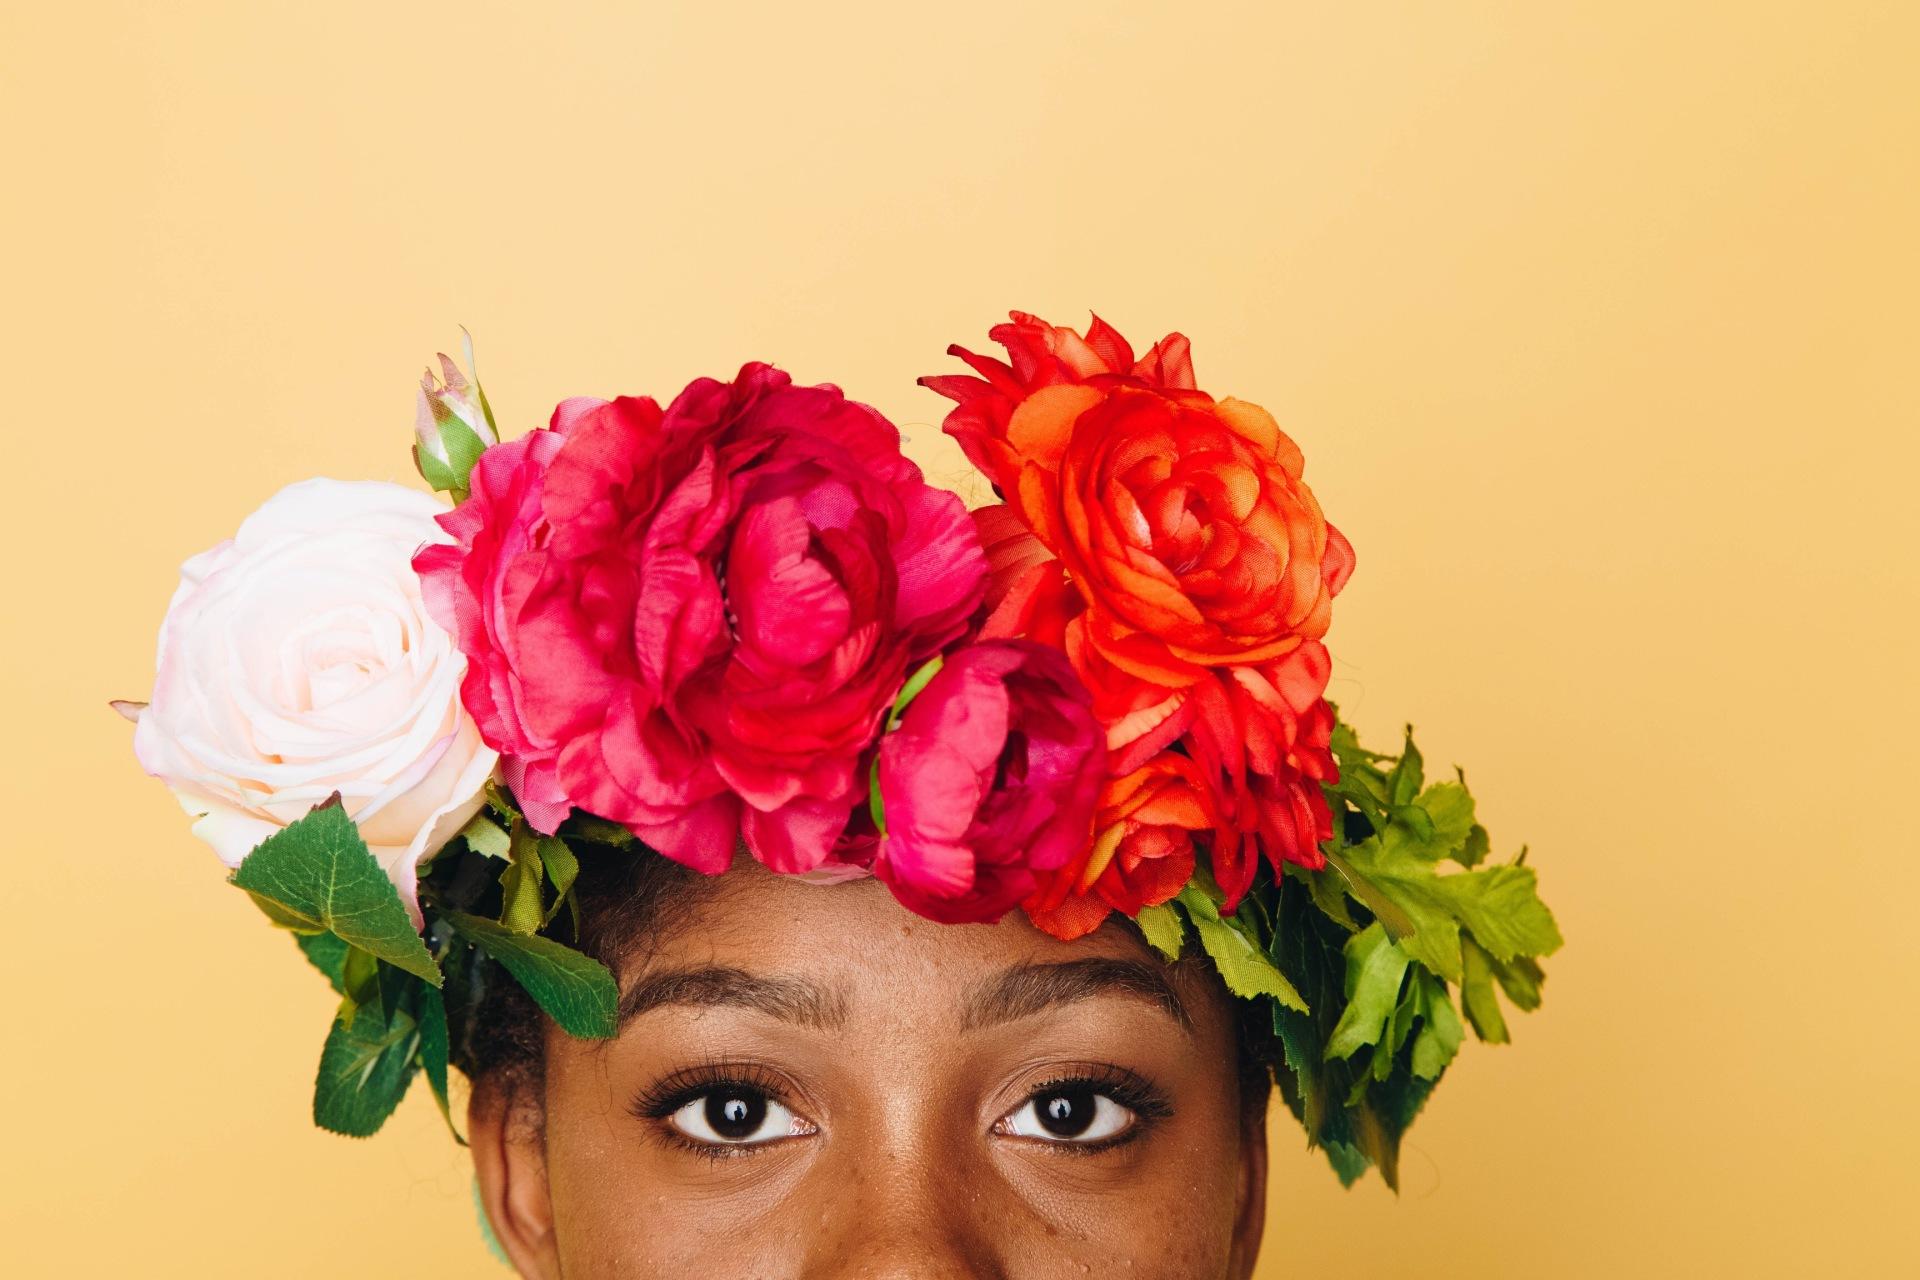 Flower crown | Flower wreath | bridal flowers | bridal crown | bridal wreath | boho bride | boho chic | festival fashion | london flower school